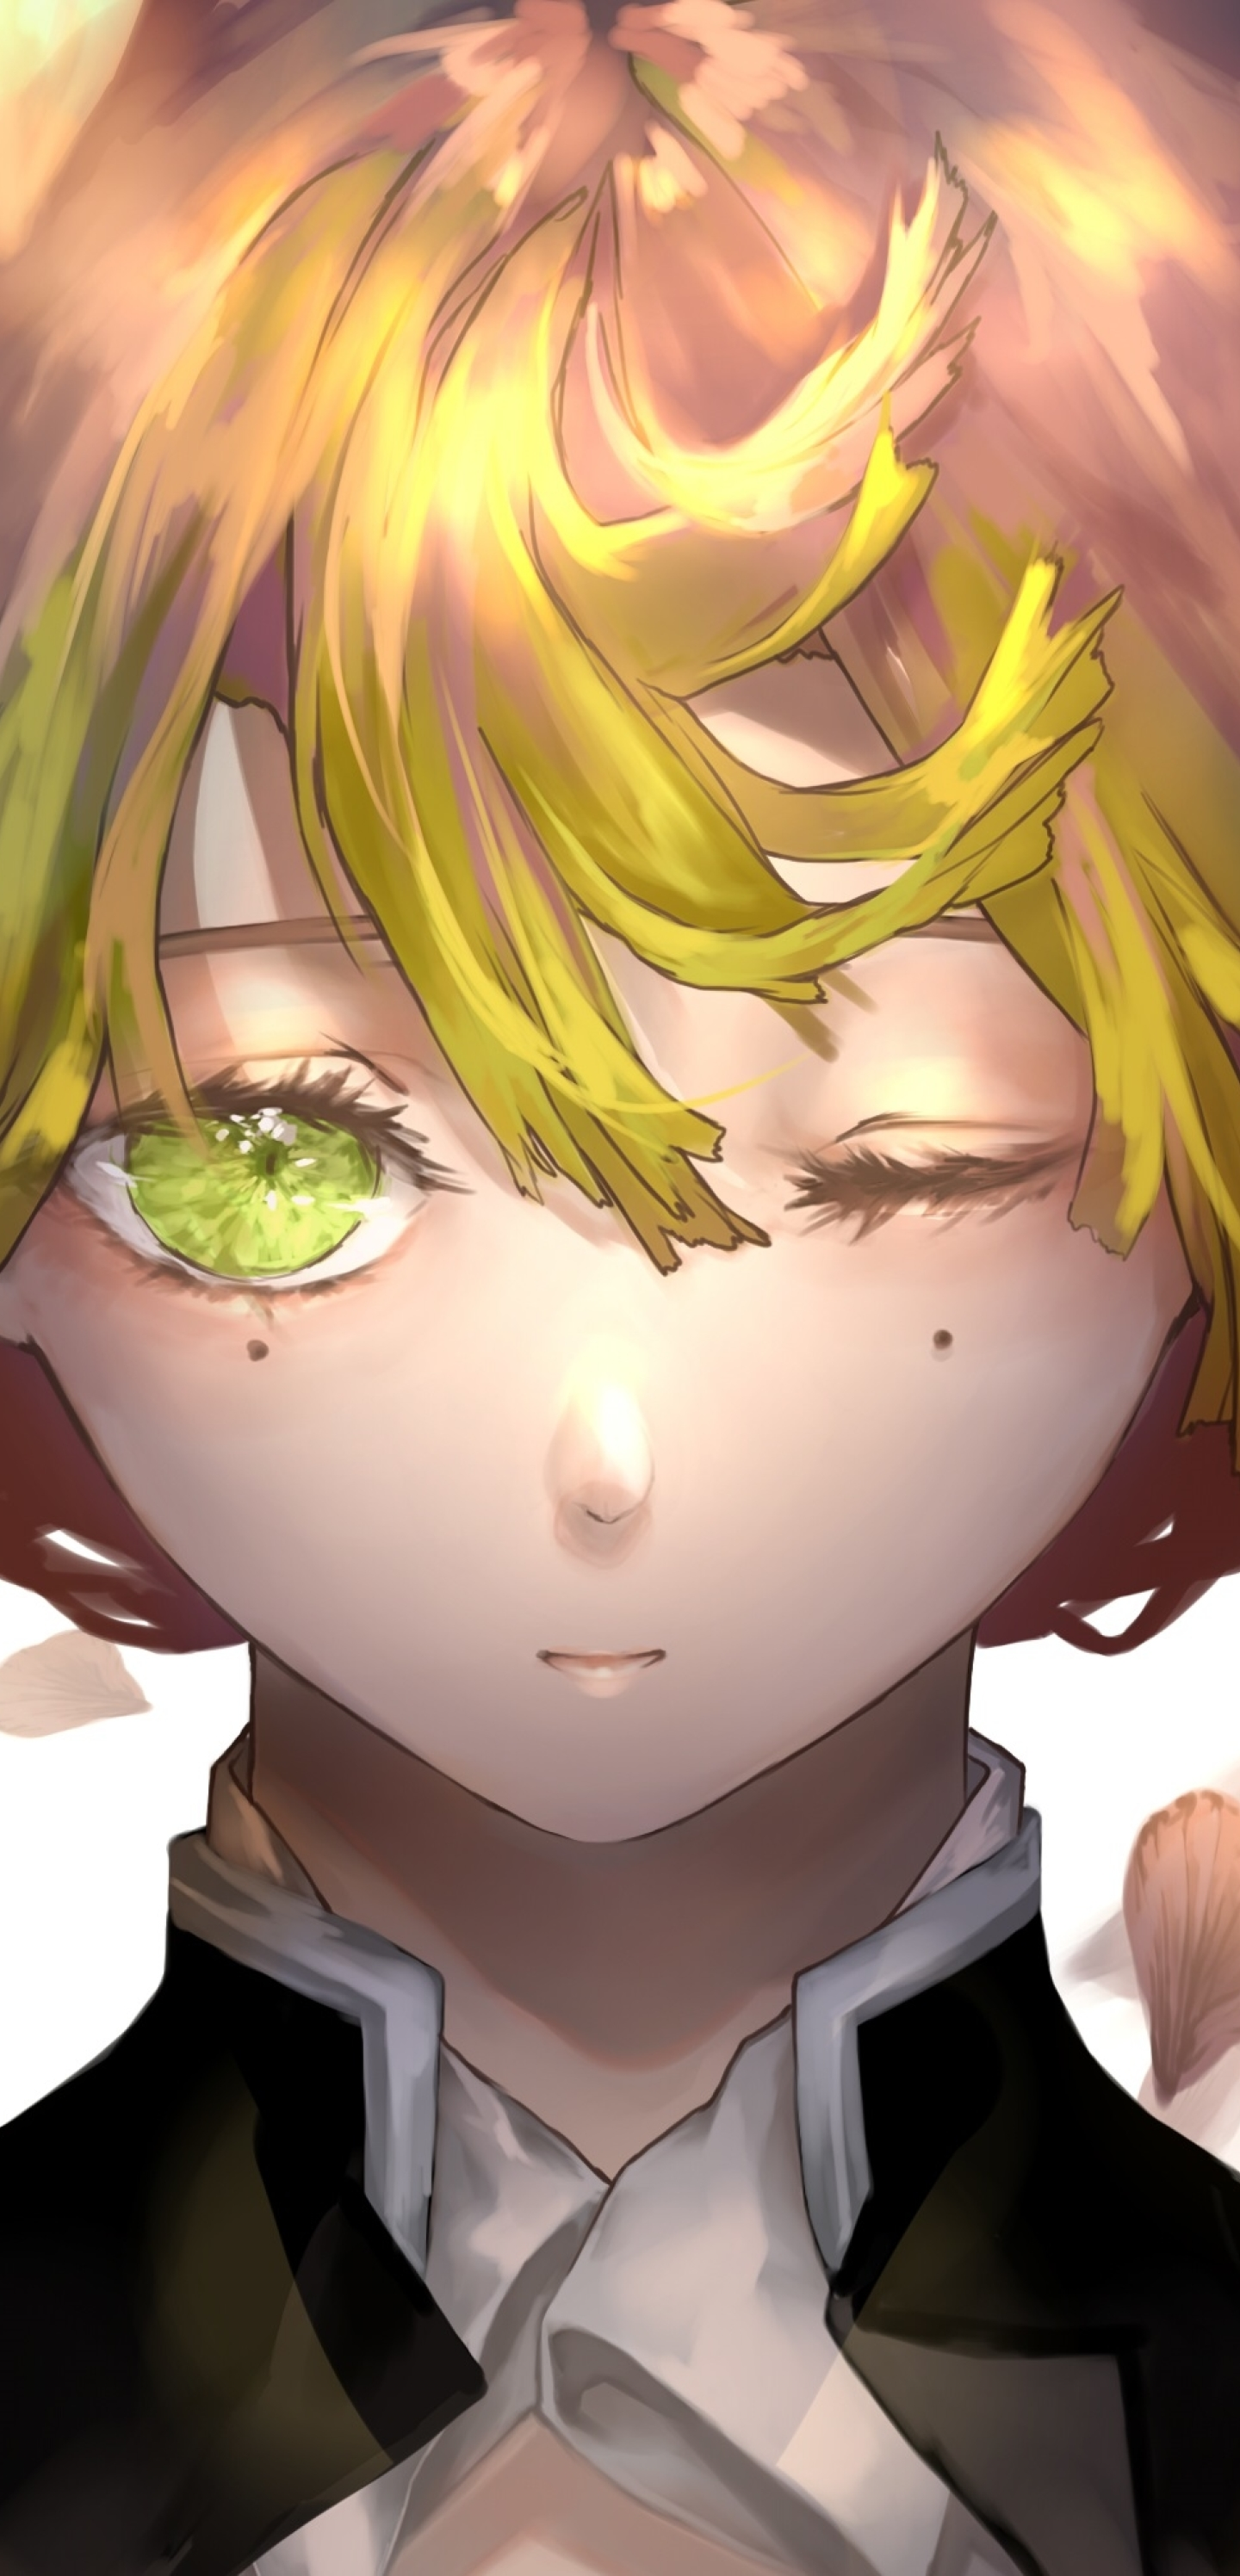 1440x2992 Mitsuri Kanroji Demon Slayer 1440x2992 Resolution Wallpaper Hd Anime 4k Wallpapers Images Photos And Background Мицури канродзи / mitsuri kanroji. 1440x2992 mitsuri kanroji demon slayer